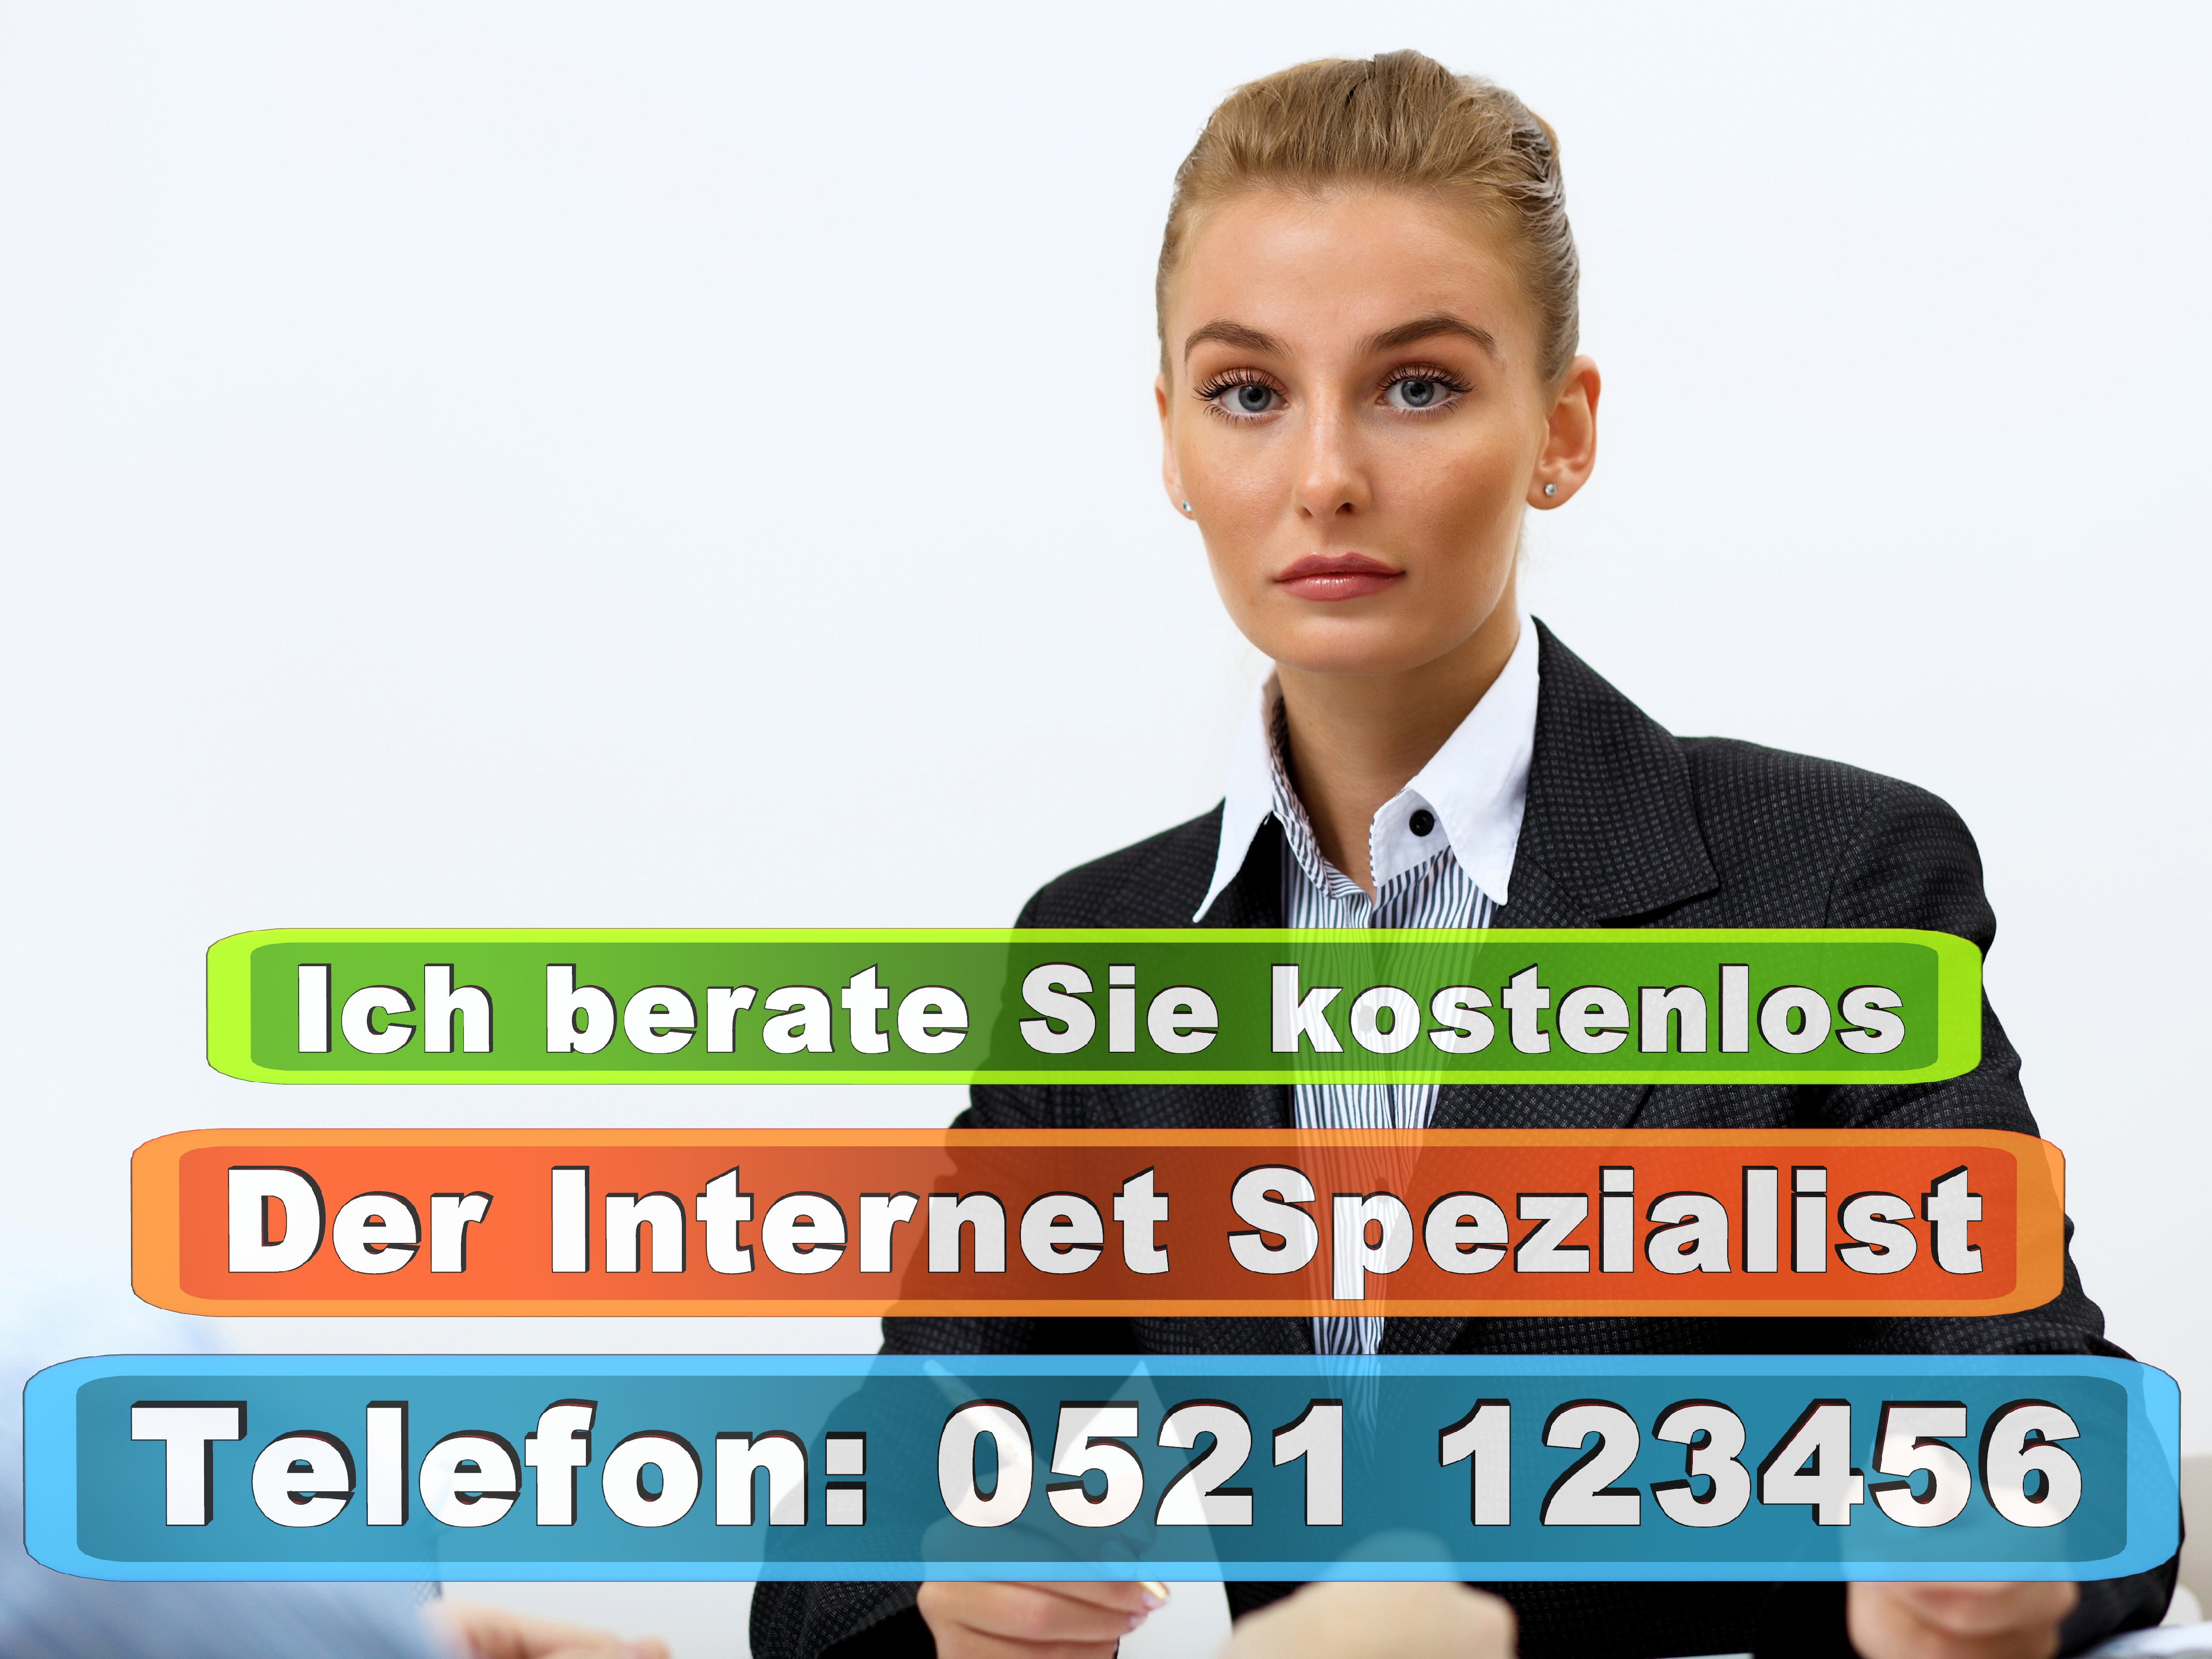 Rechtsanwalt In Bielefeld Steuerberater NRW OWL Paderborn Münster Dortmund Berlin Hamburg Düsseldorf Köln (2)